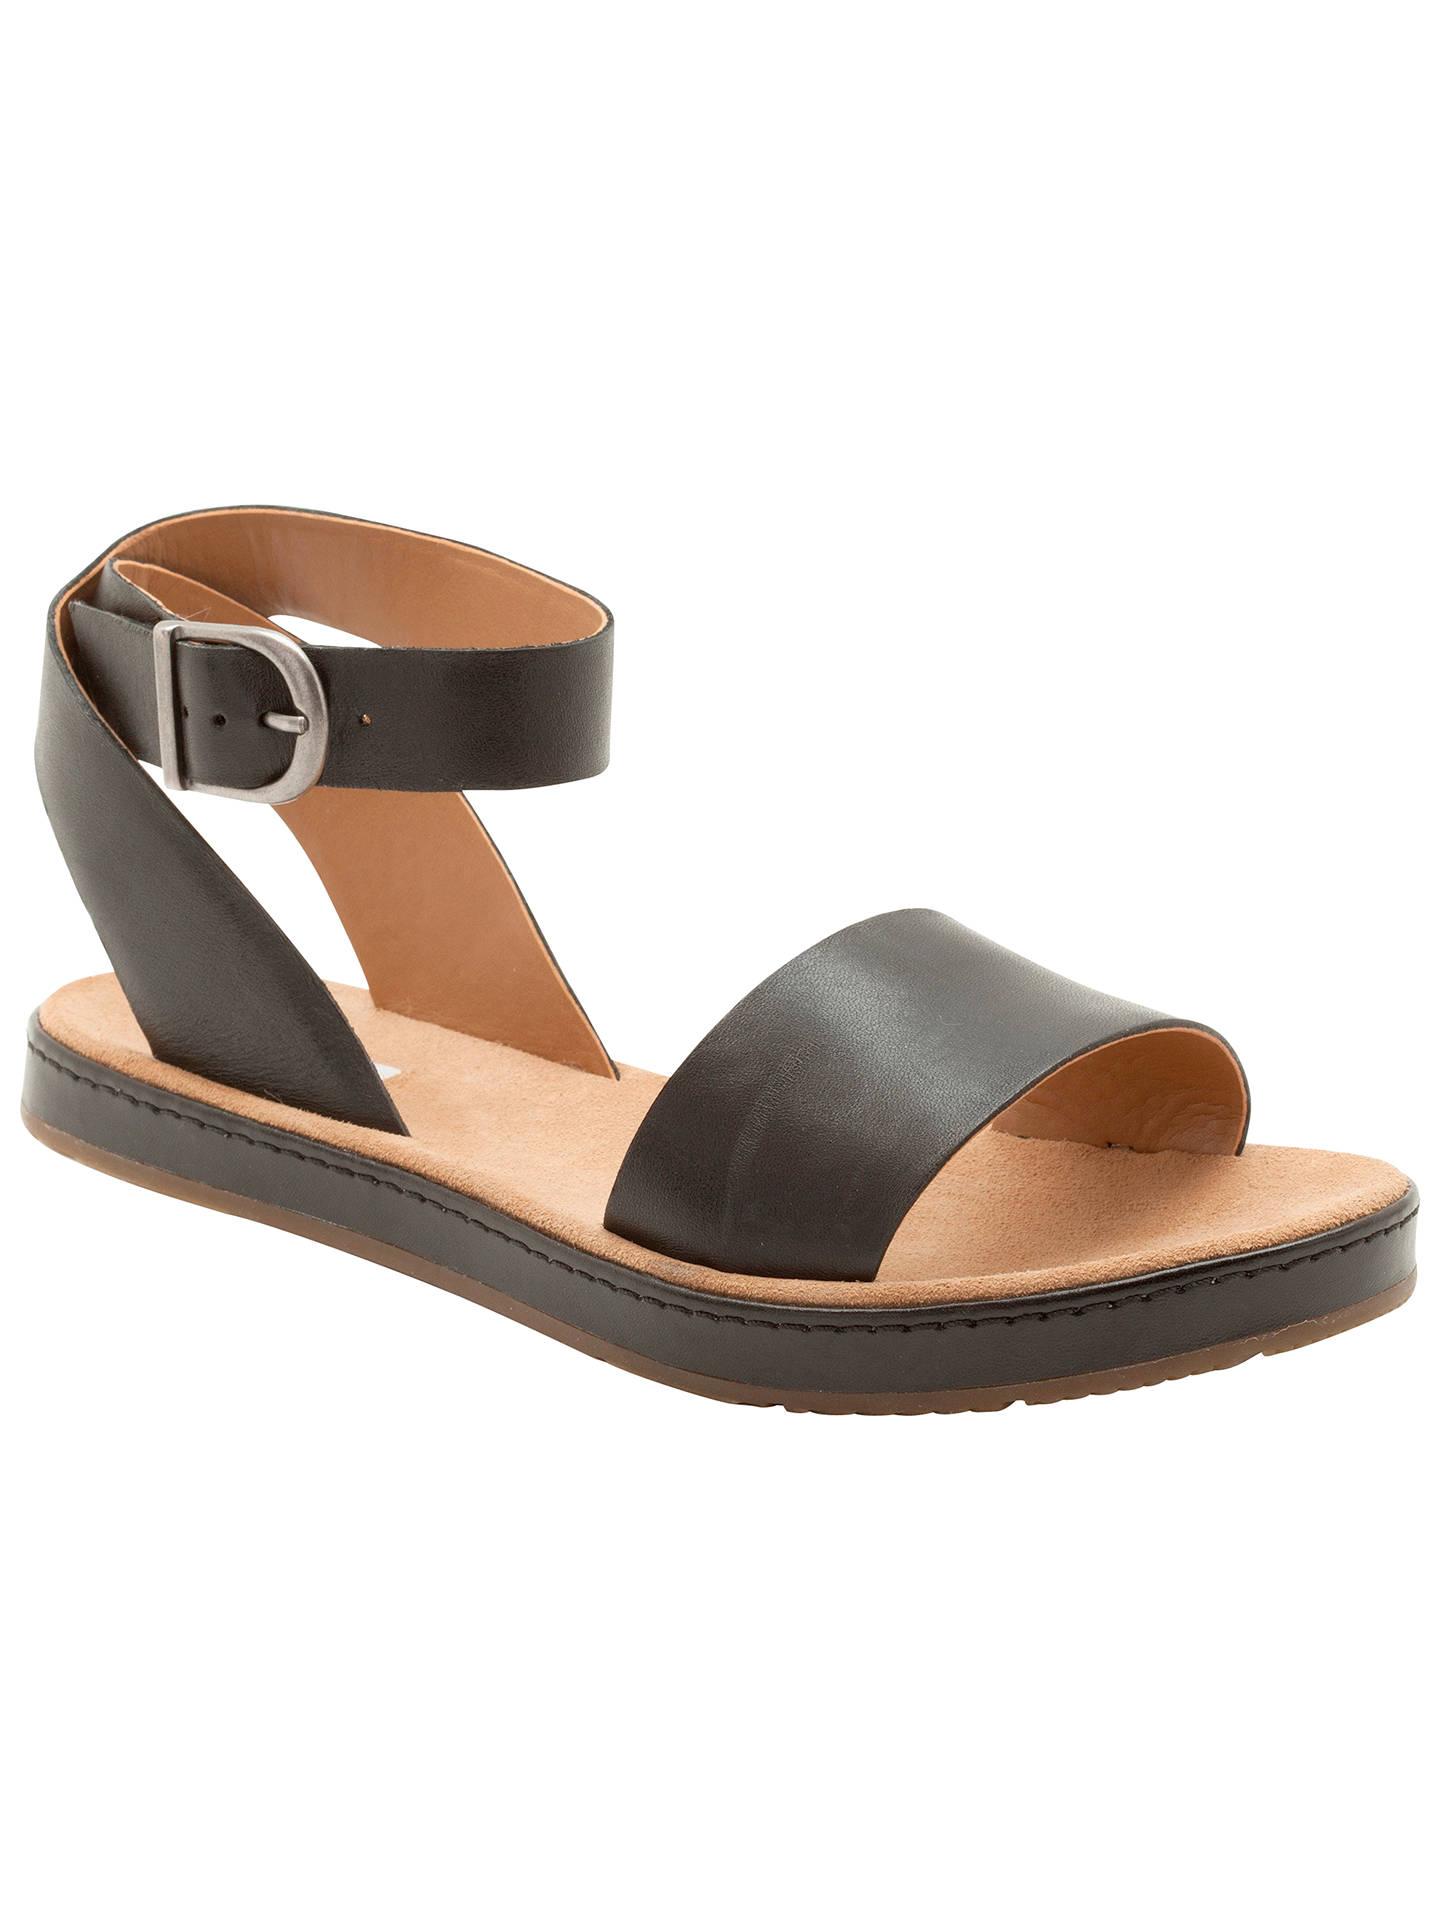 b43176e121f2 Clarks Romantic Moon Leather Sandals at John Lewis   Partners